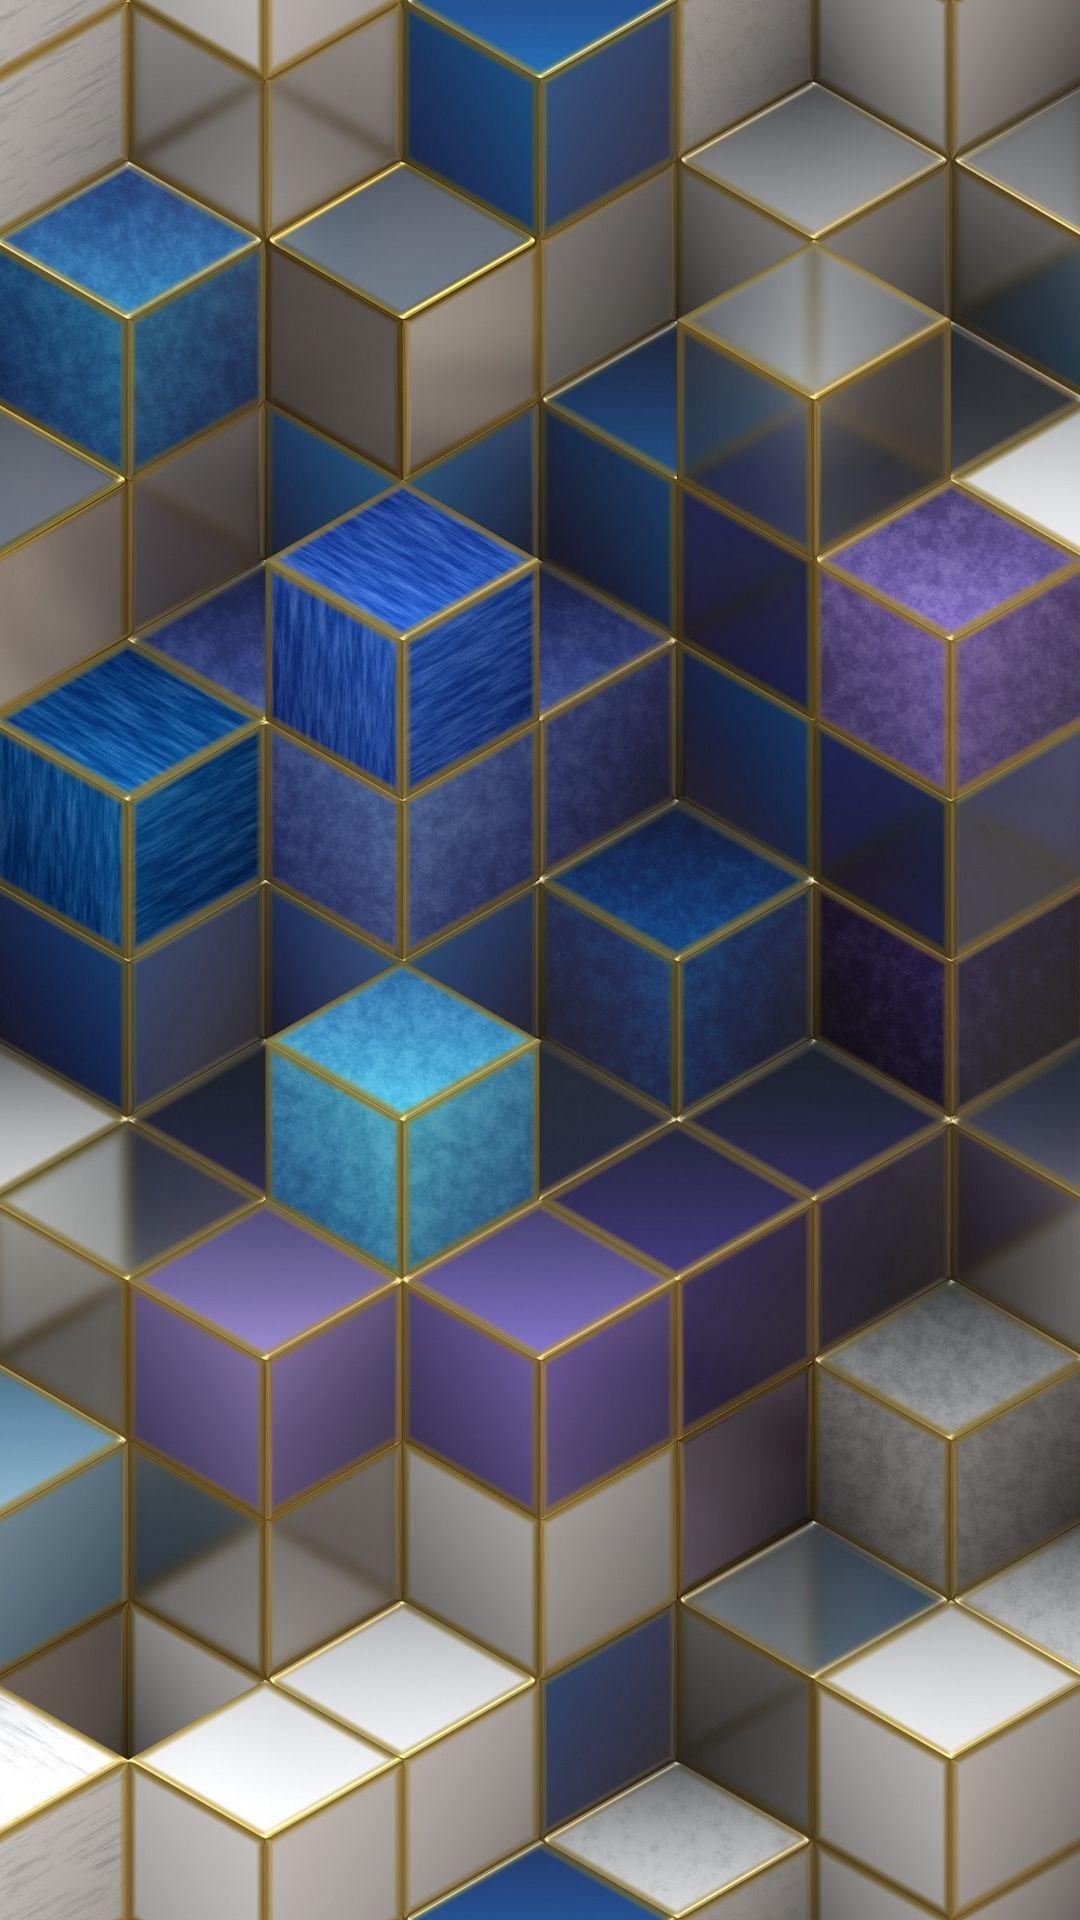 3D Cubes Metal Space Hd Wallpaper